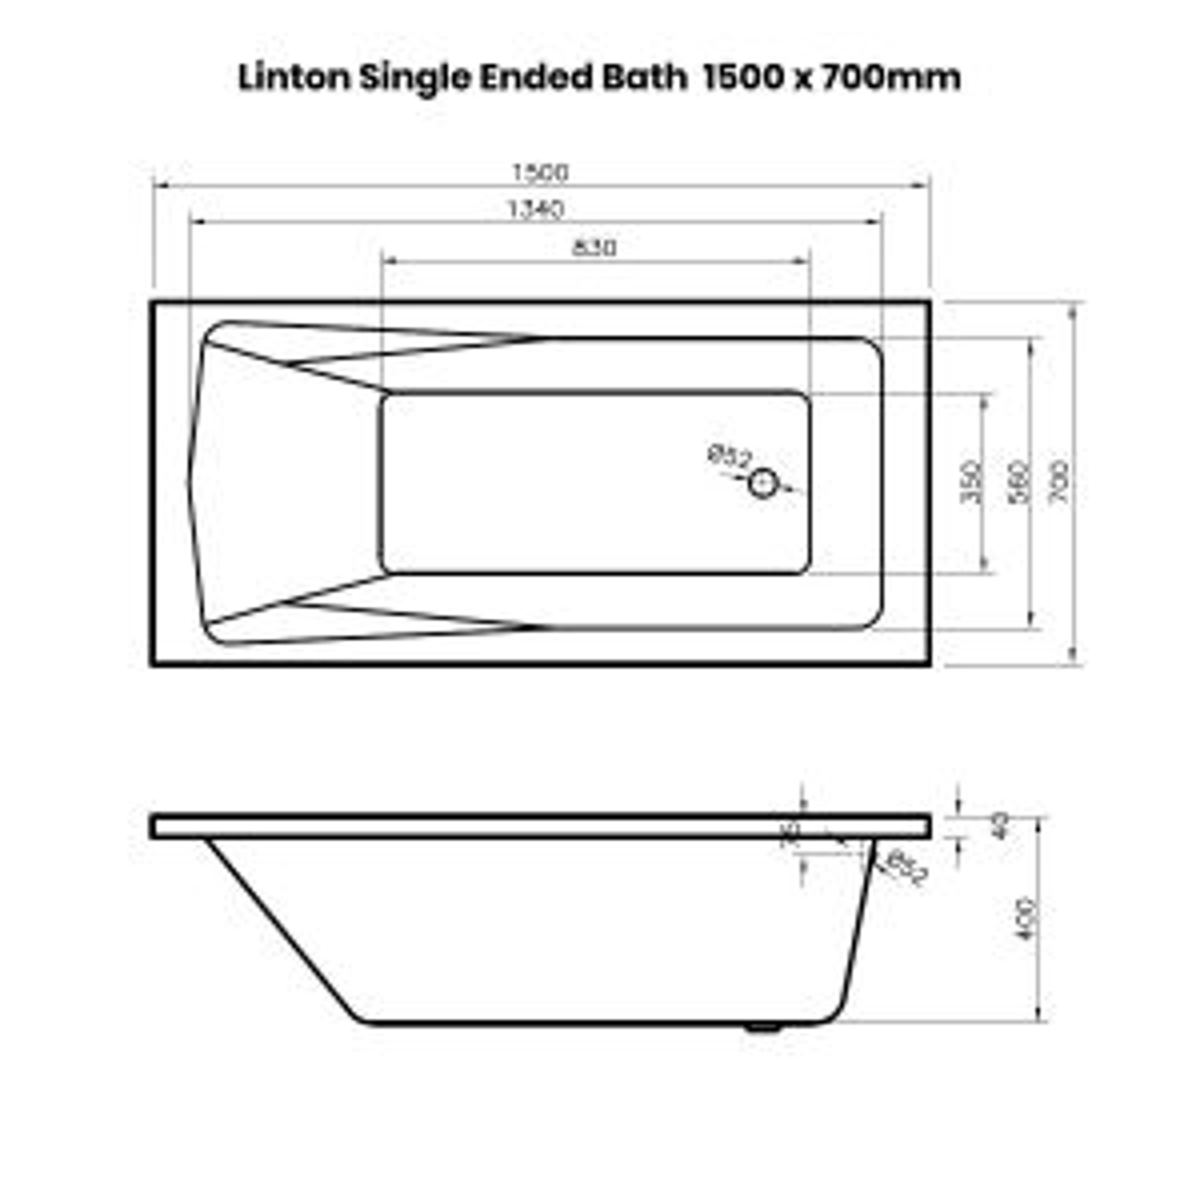 Nuie Linton Straight Shower Bath 1500 x 700mm Dimensions